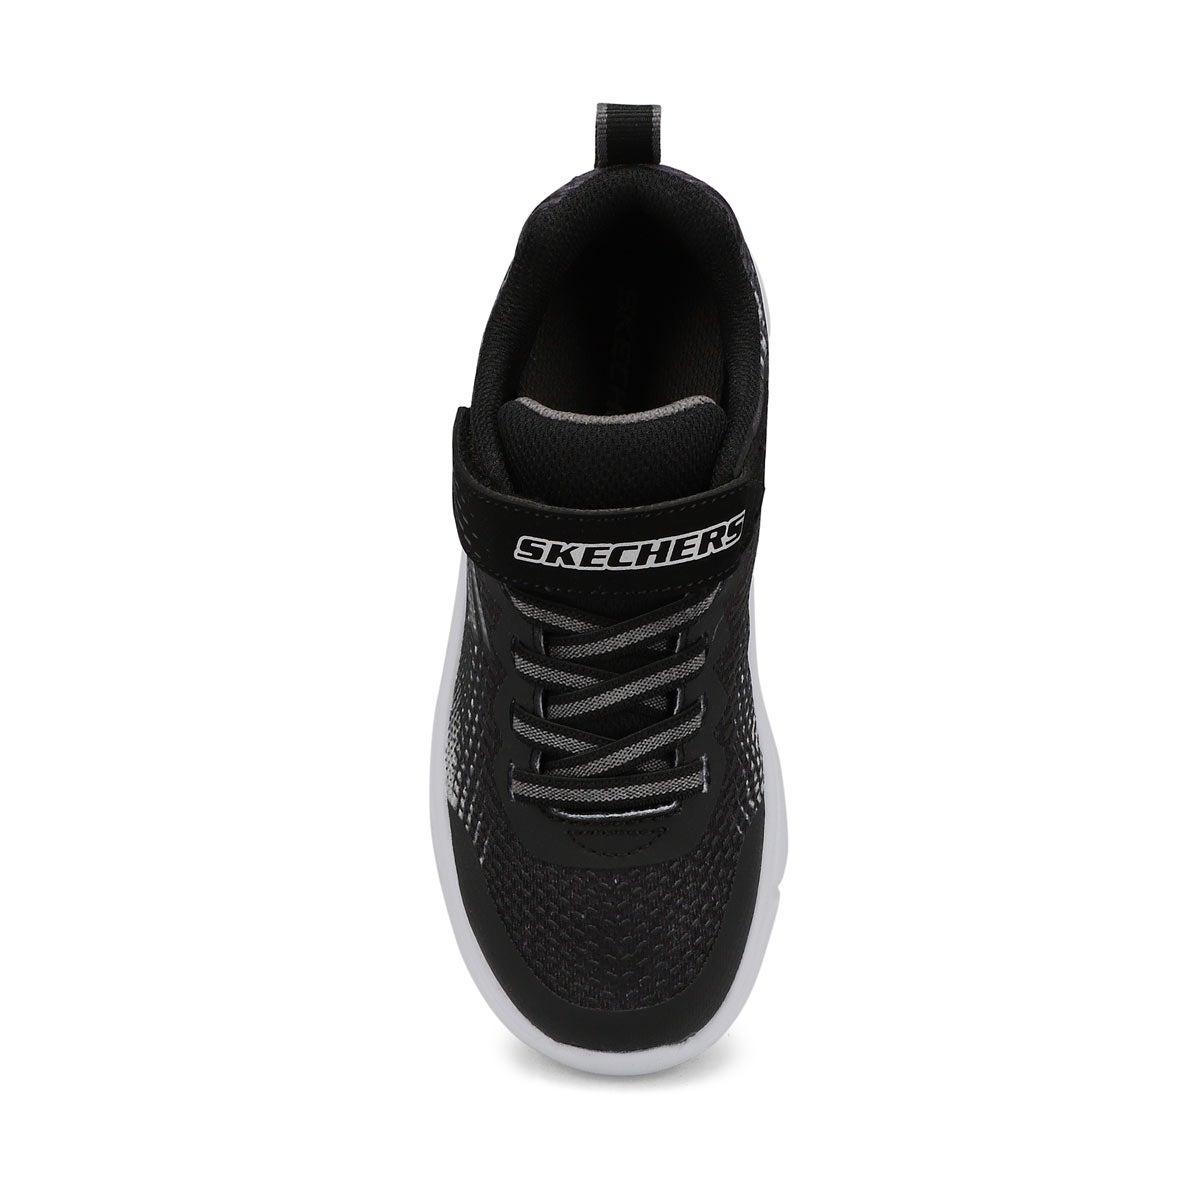 Boys' Go Run 650 Sneakers - Black/Silver